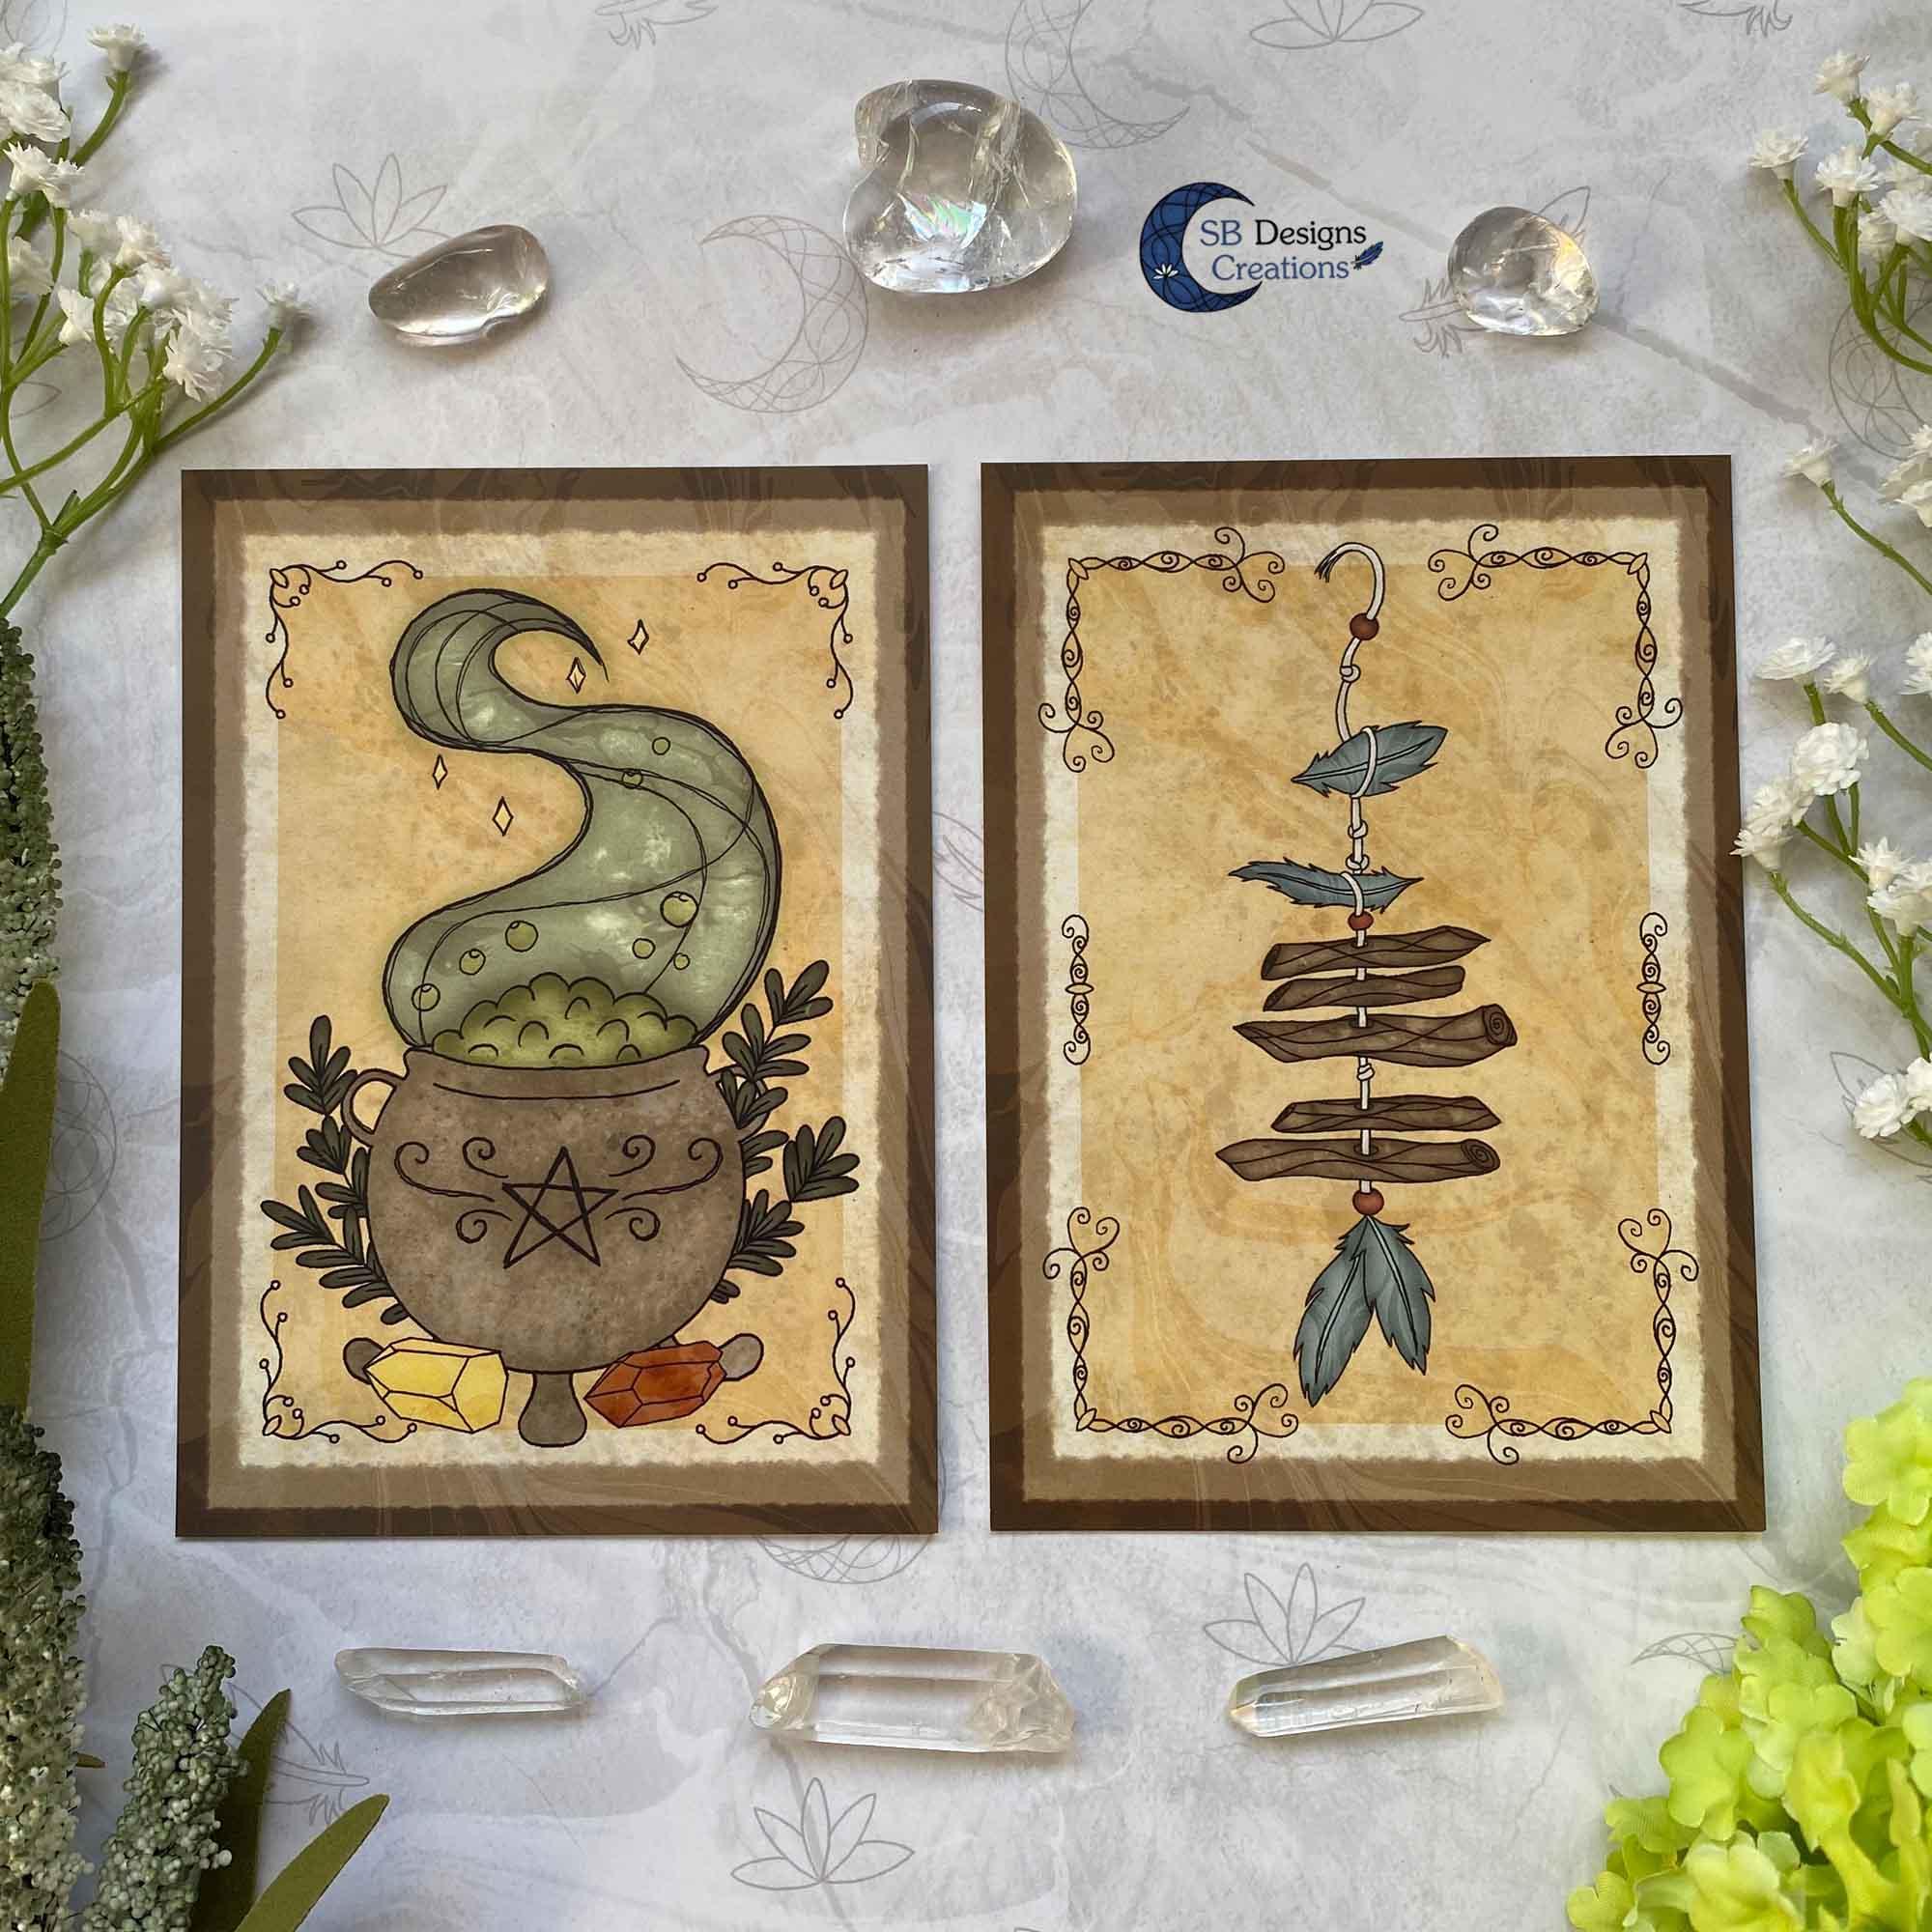 Heks Ansichtkaarten Witchy Vibes heksenhoed Bezem Triple Moon Vuurmagie Cauldron Art-6